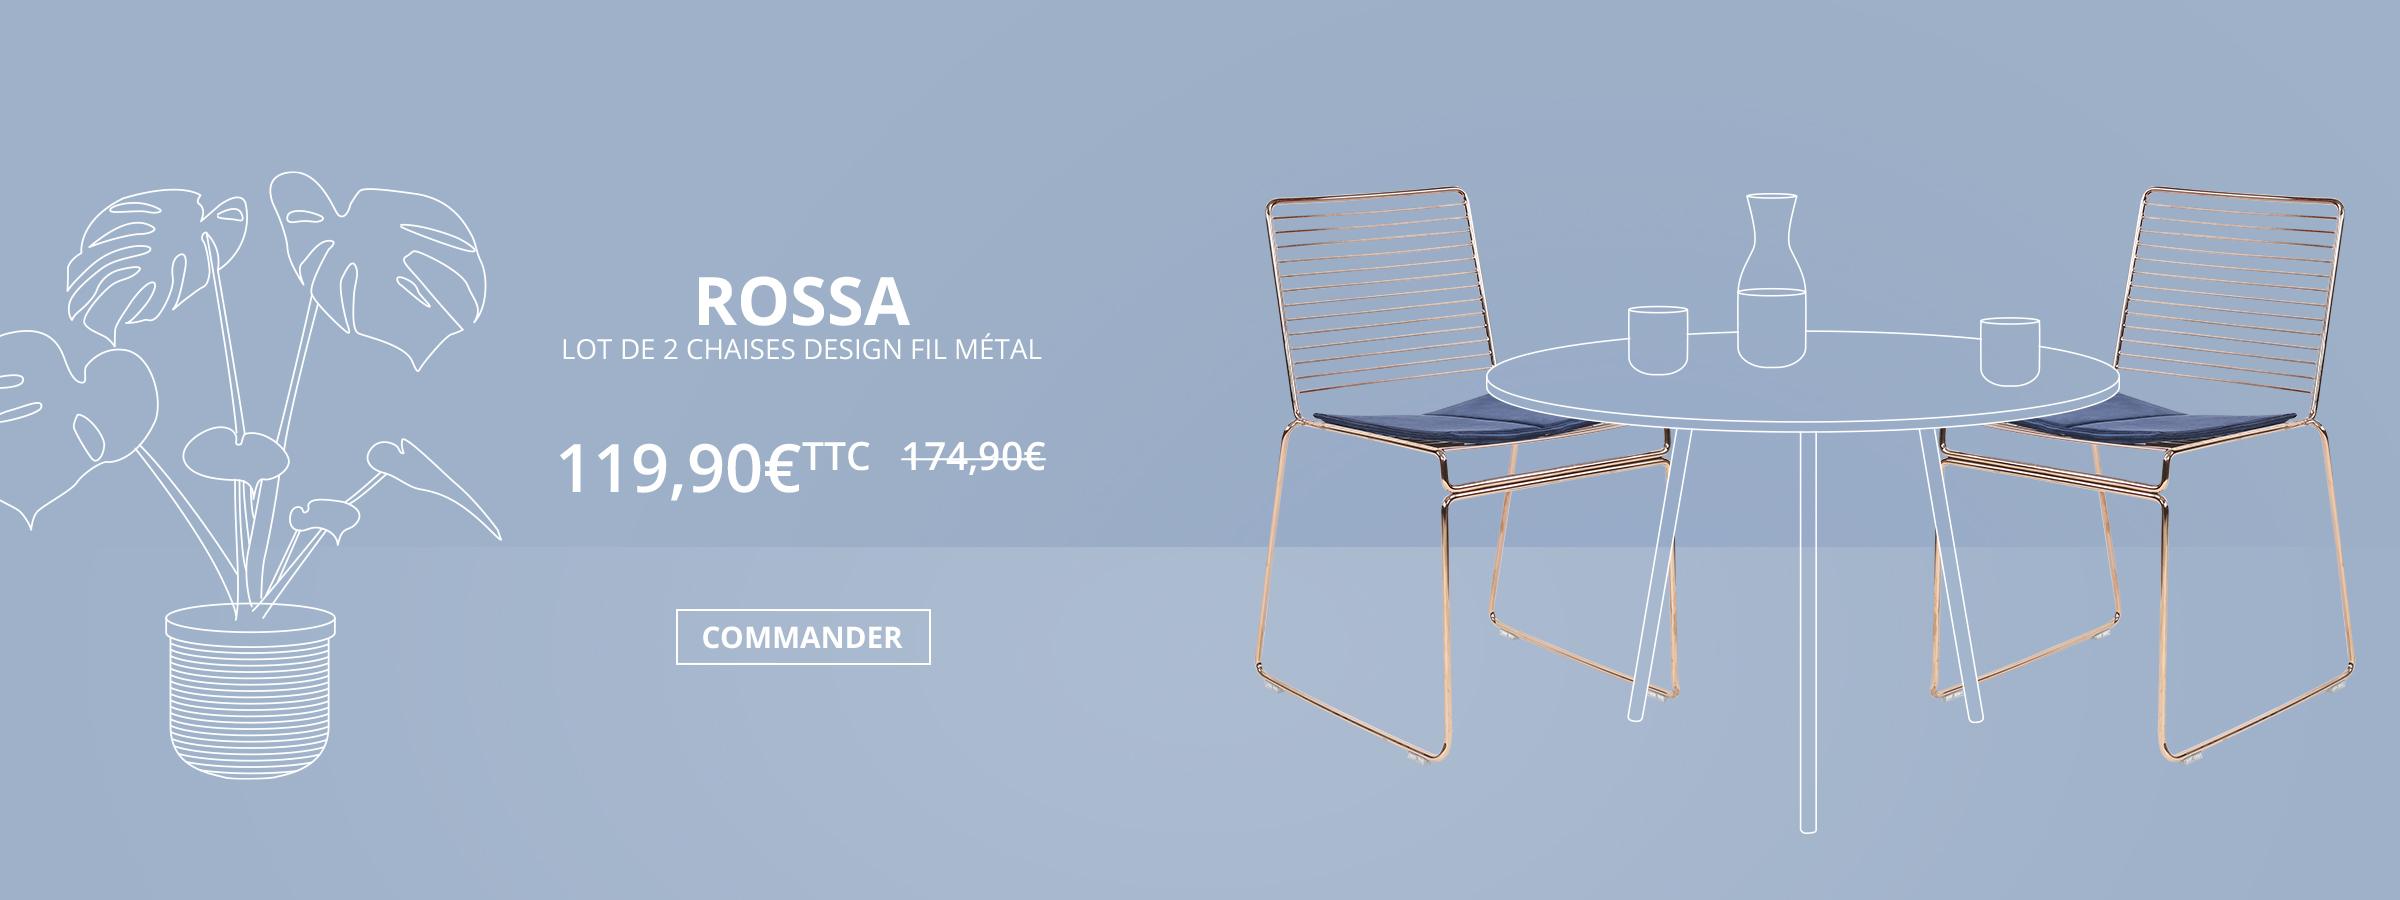 250121_2400x900-HP_ROSSA